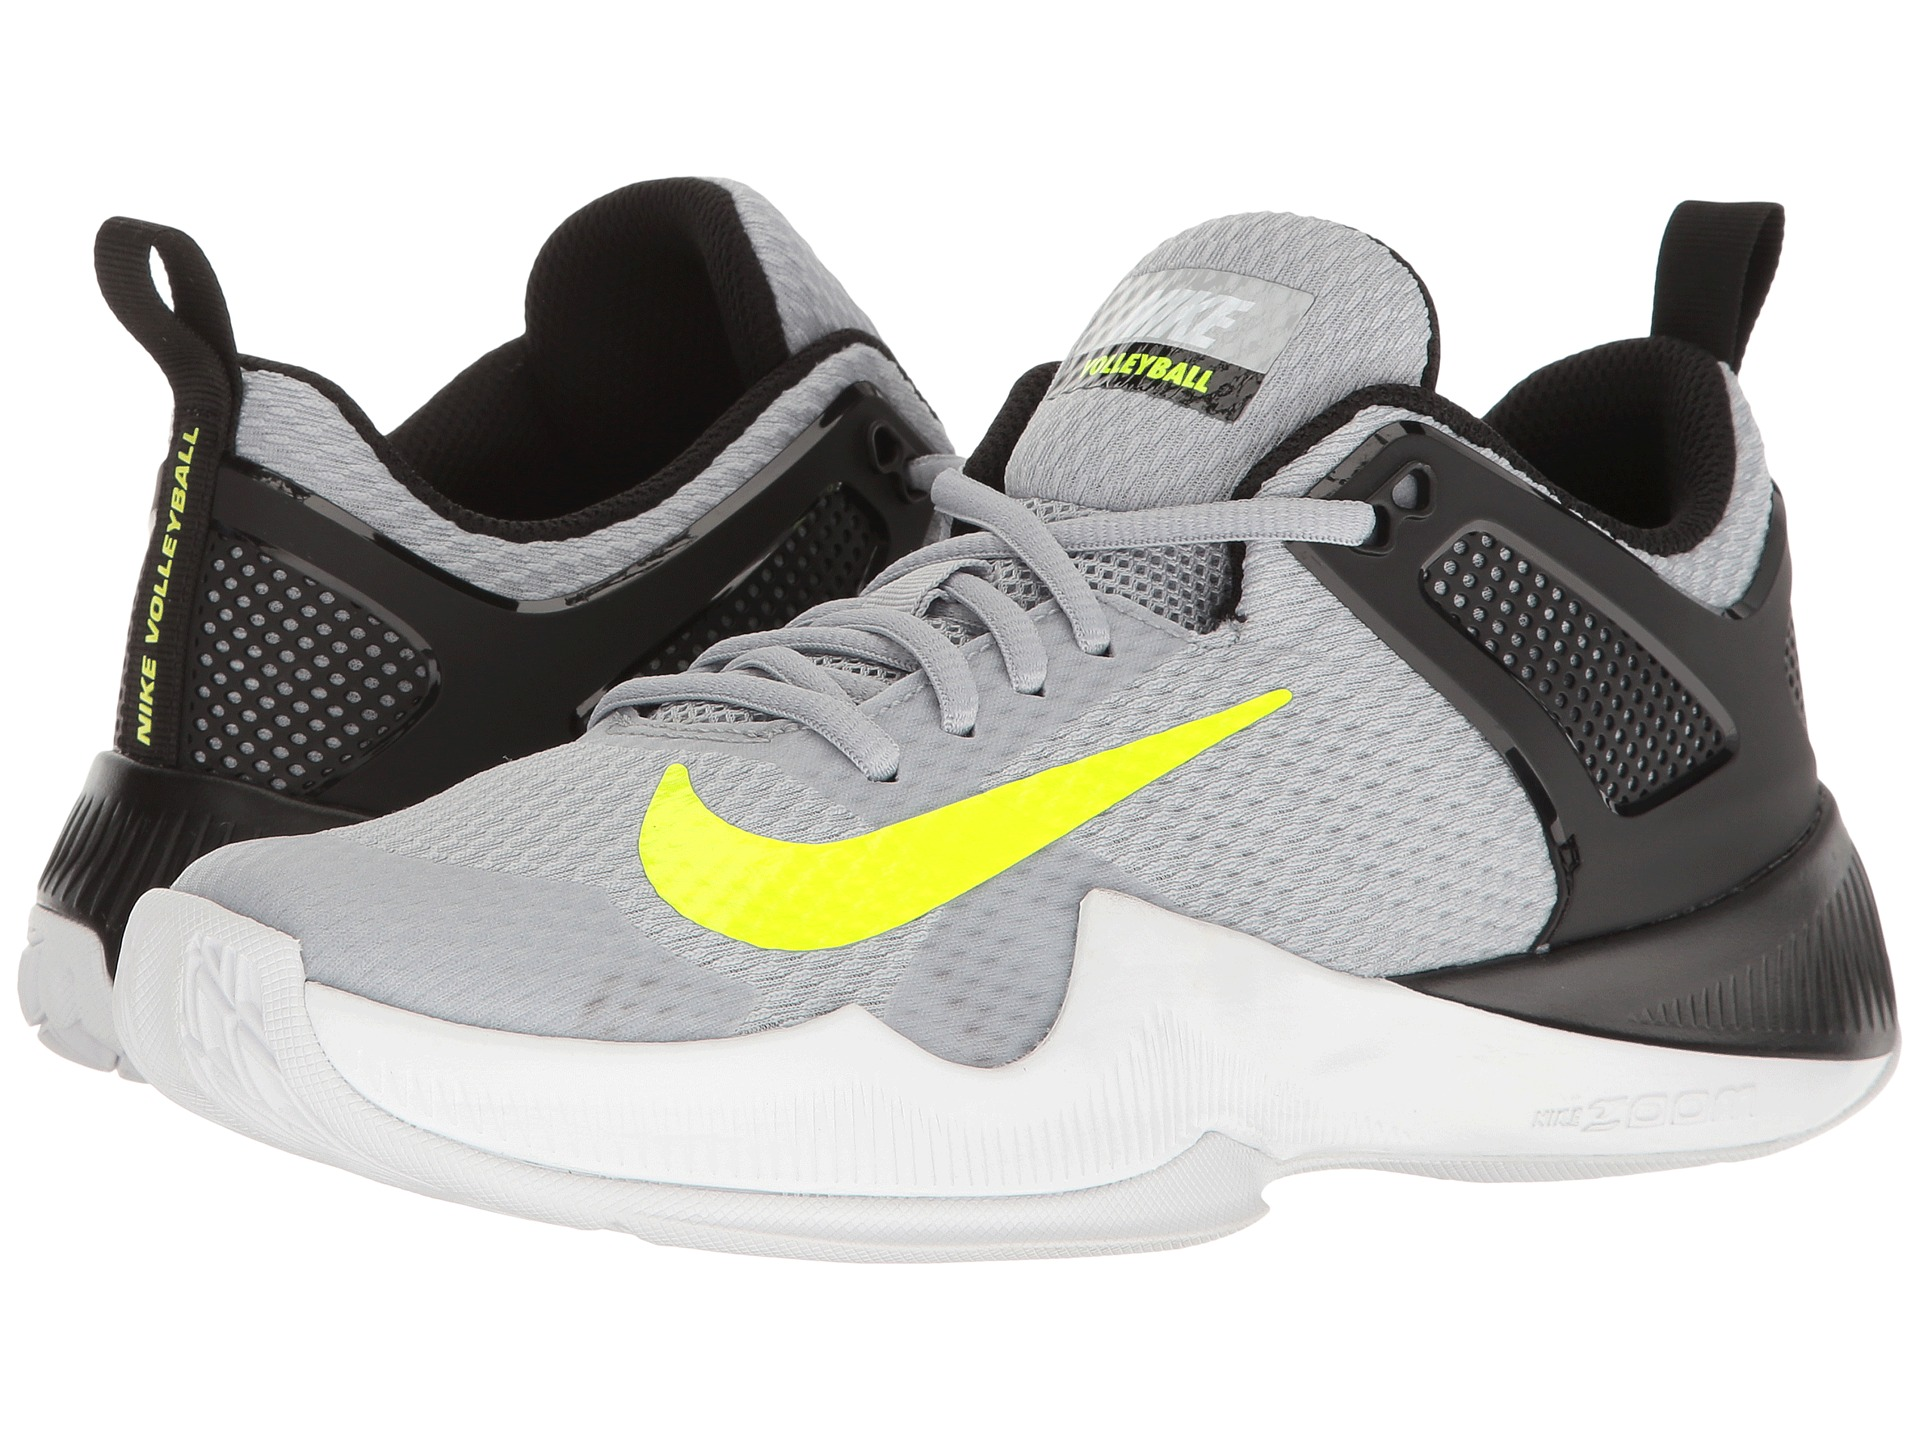 Nike Nike Women S Air Zoom Hyperace Shoes On Sale